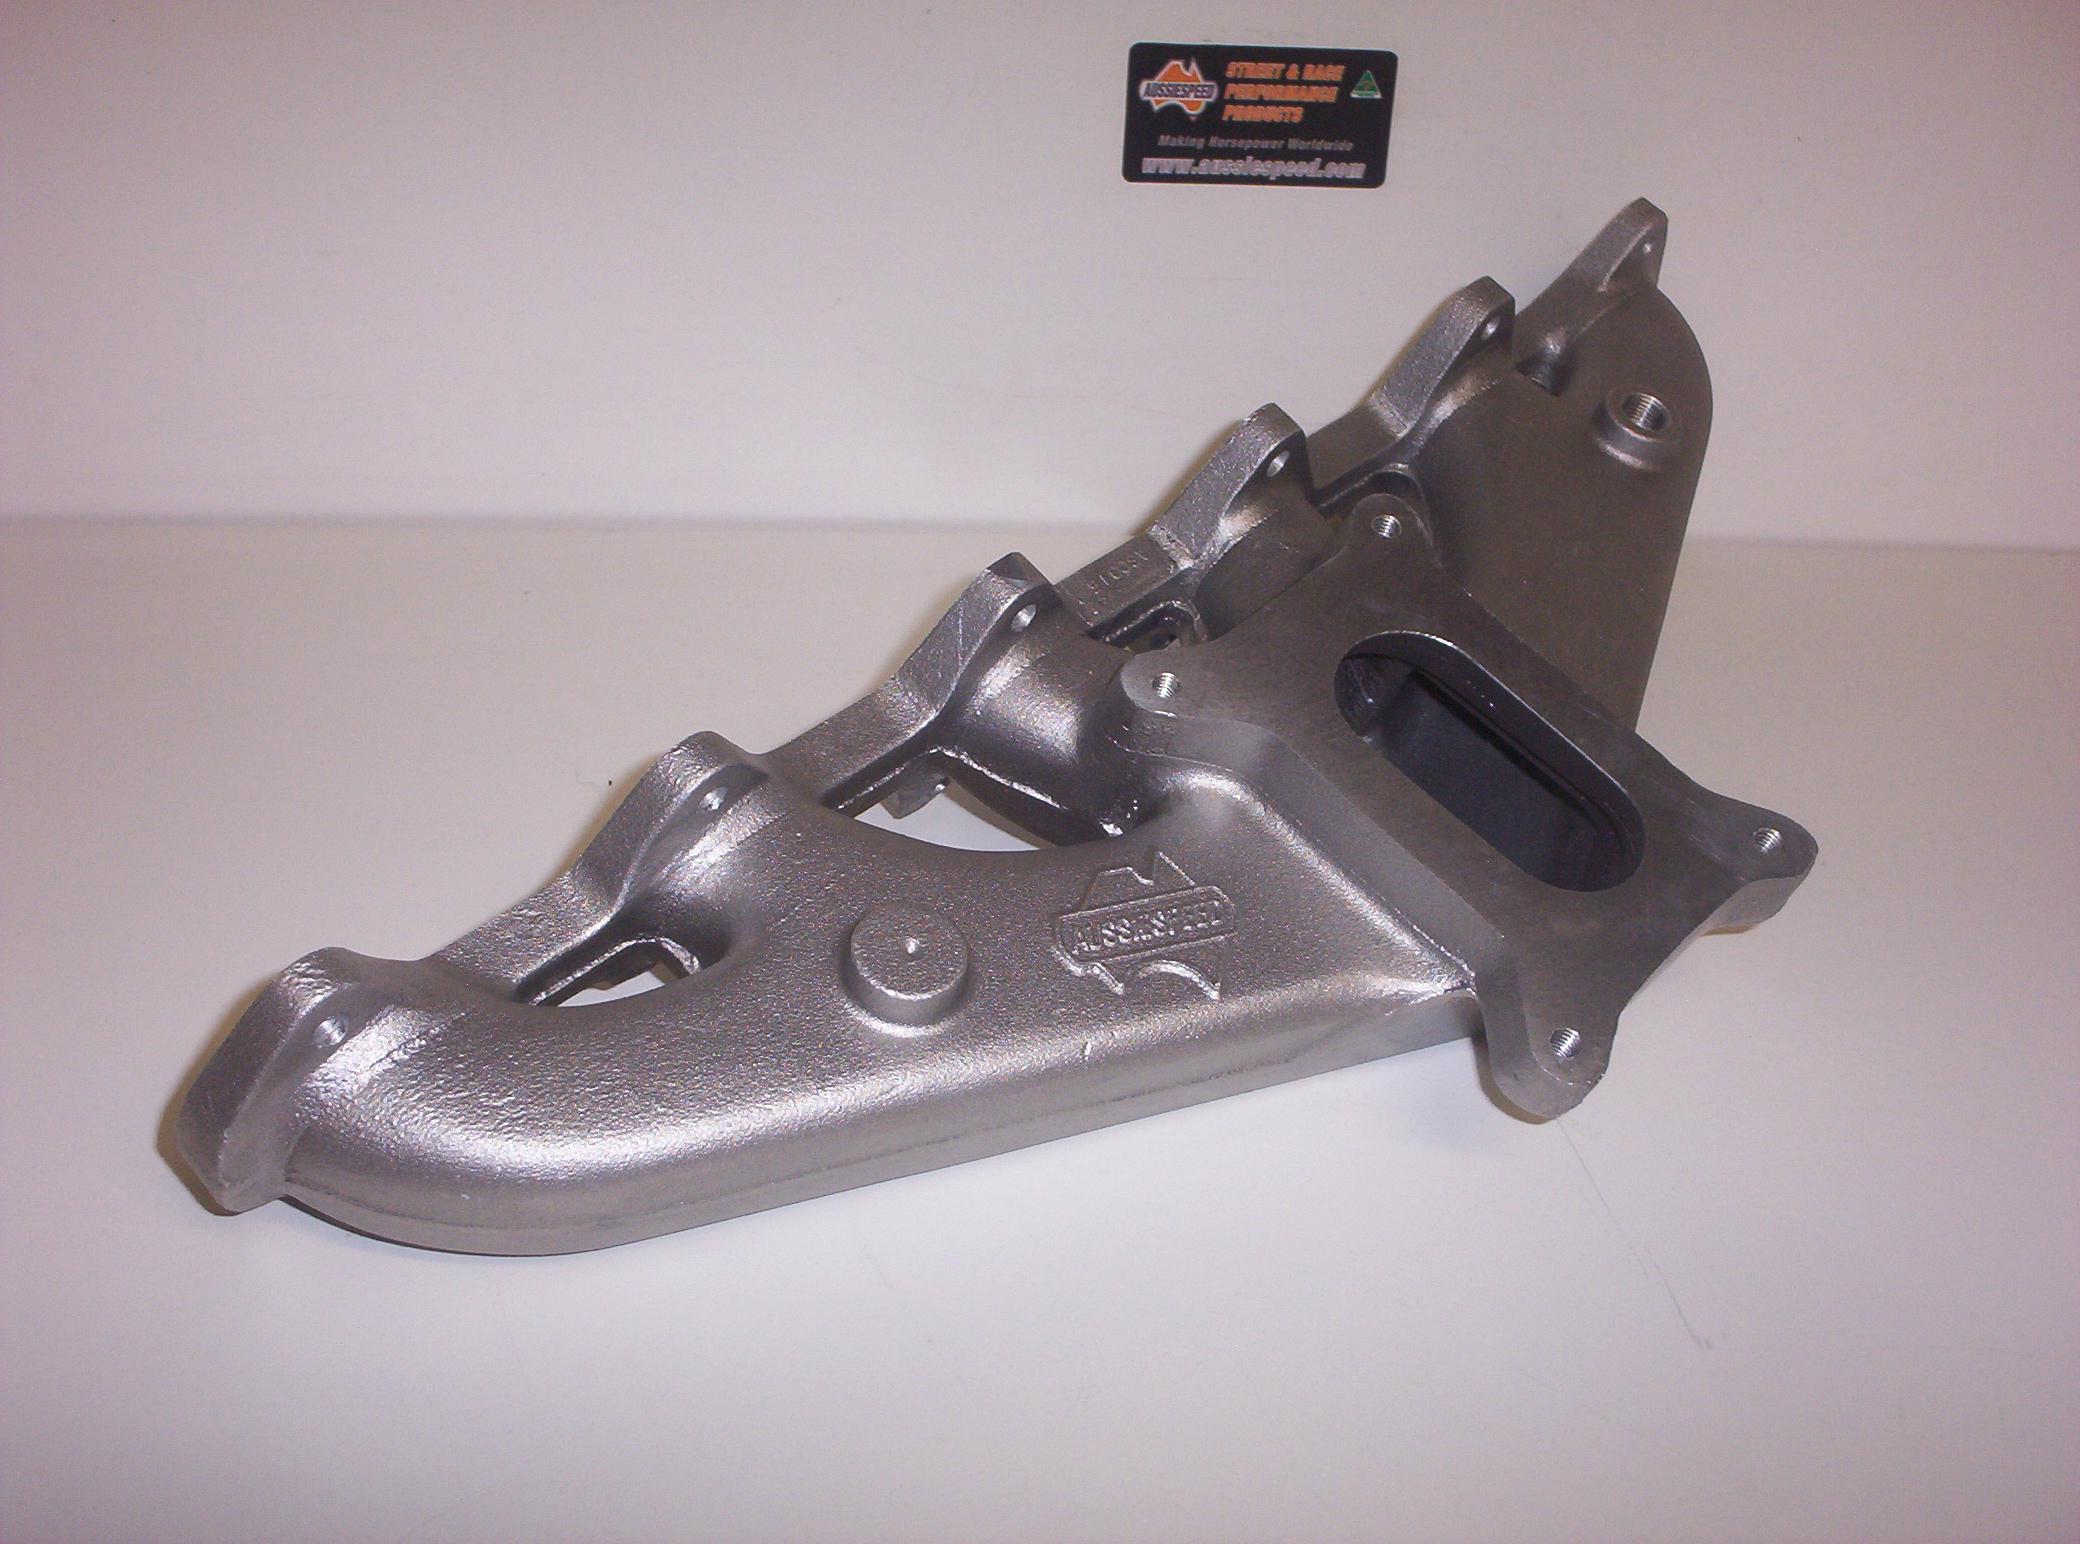 HSS-E WIDIA GTD VTSPO5616 VariTap VTSPO56 Multipurpose Tap Right Hand Cut 3 Flutes TiCN Coating Plug Chamfer M3.5 X 0.6